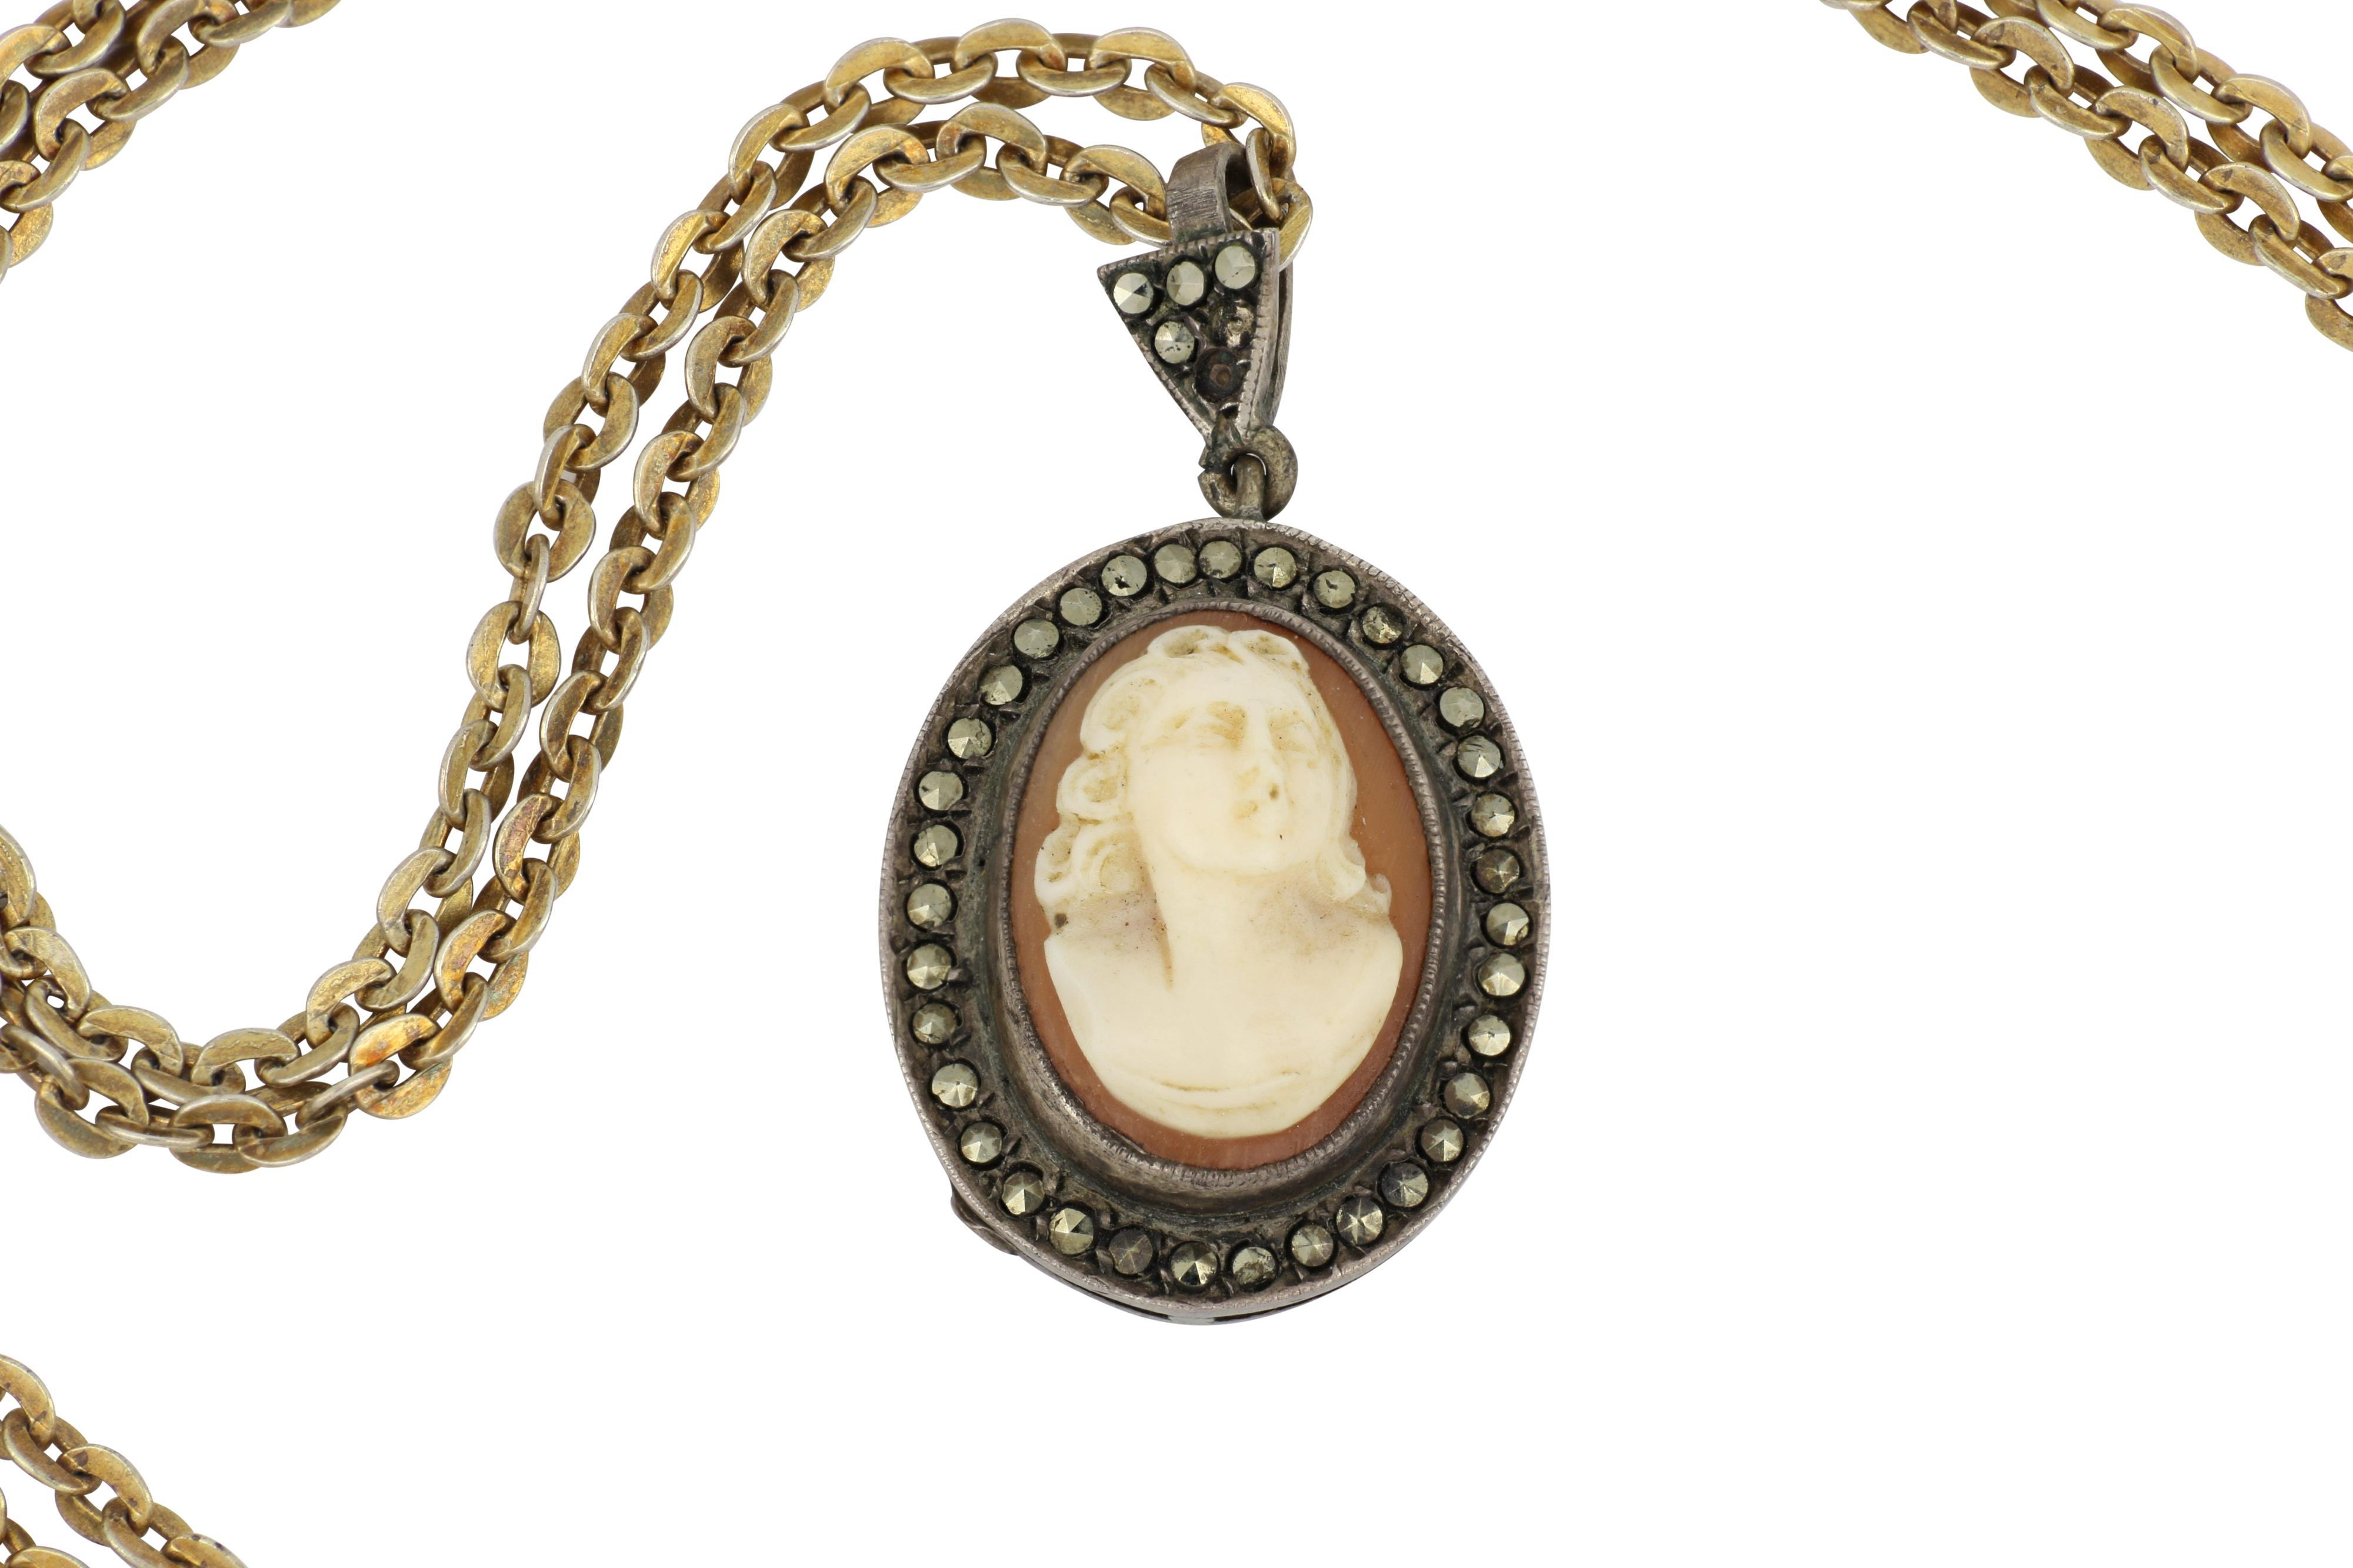 Antique cameo pendant on chain